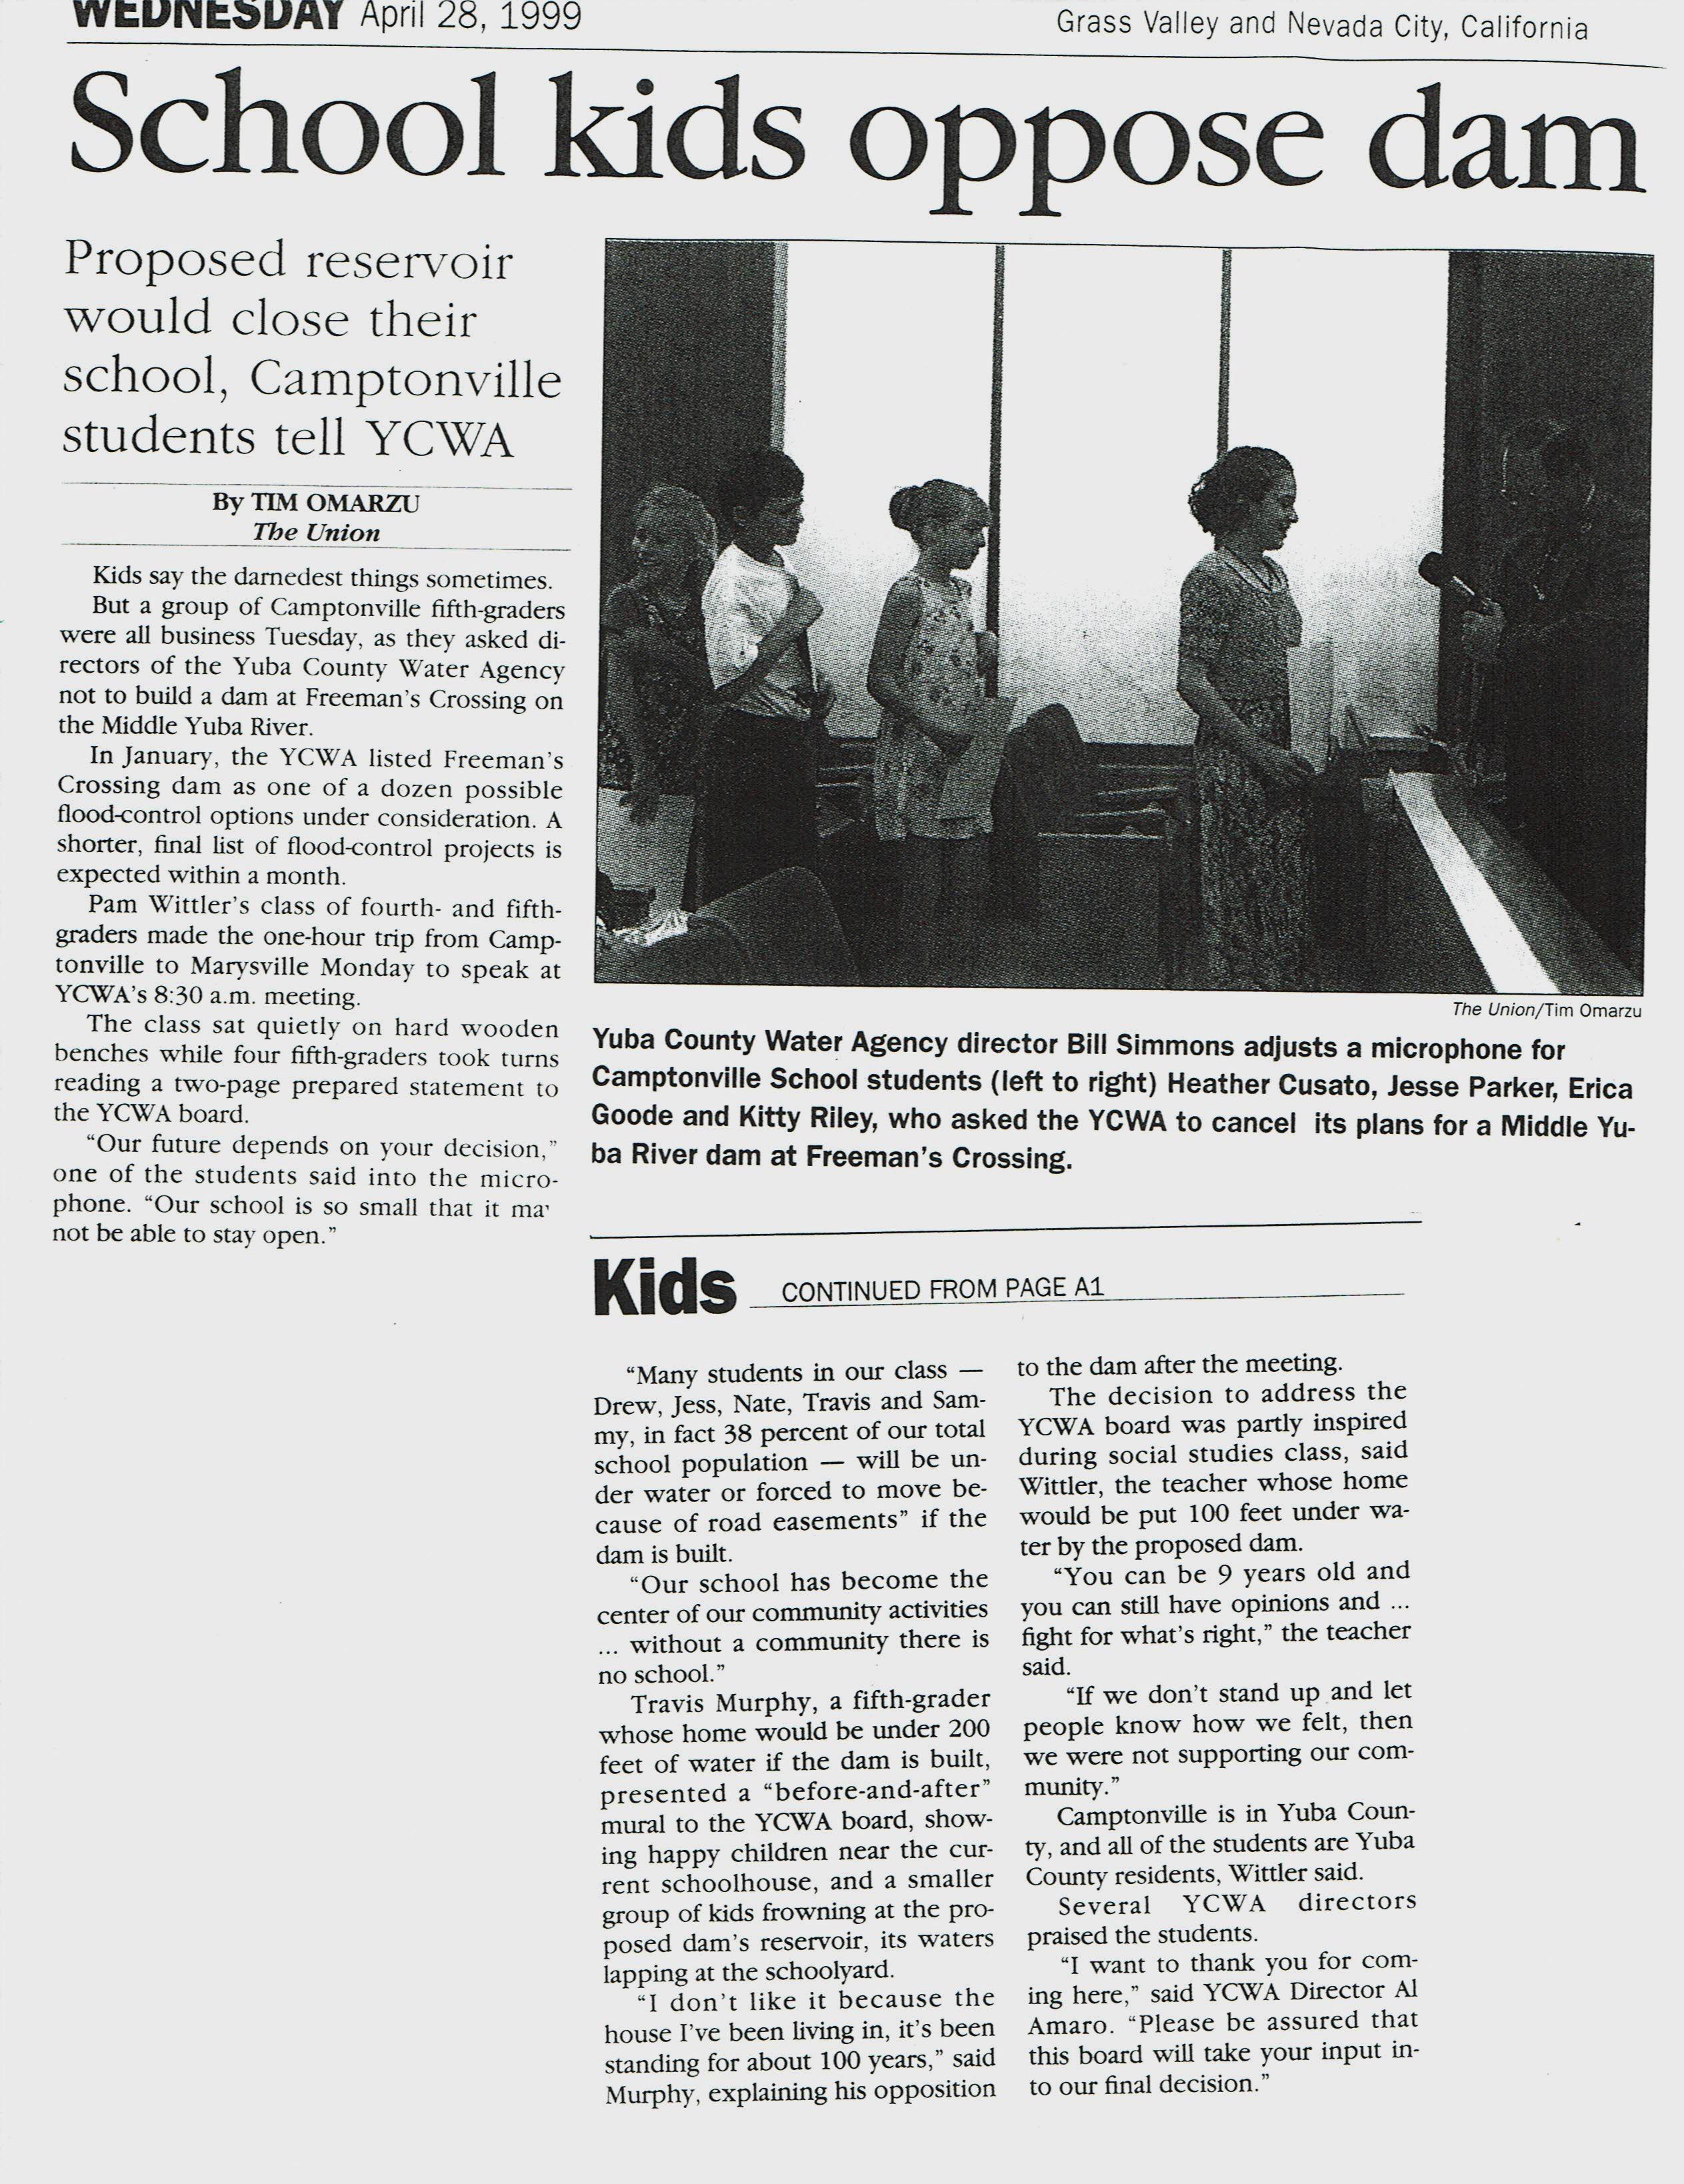 CV Students Oppose Dam 1999